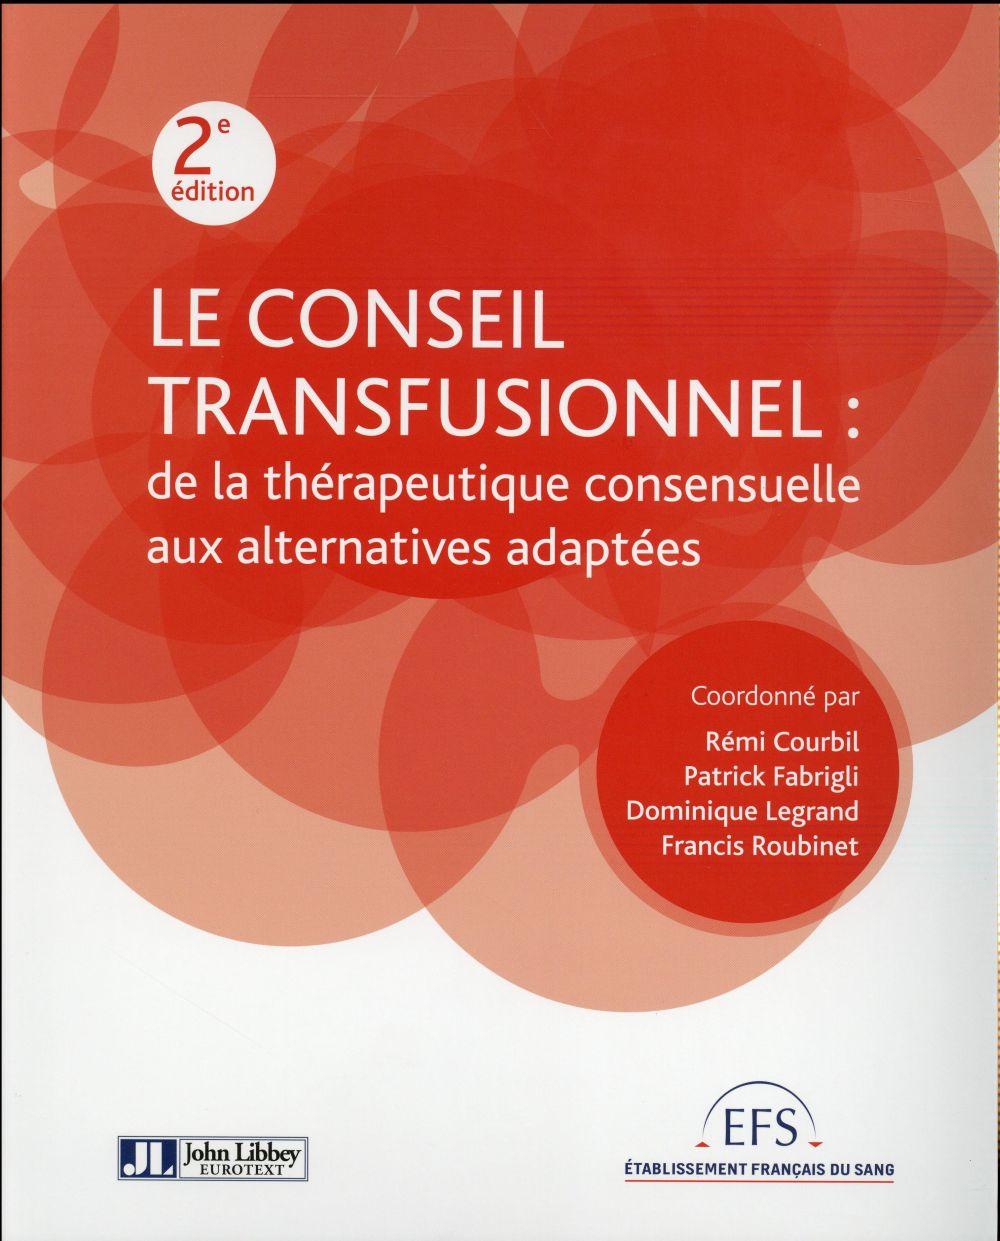 LE CONSEIL TRANSFUSIONNEL : DE LA THERAPEUTIQUE CONSENSUELLE AUX ALTERNATIVES ADAPTEES